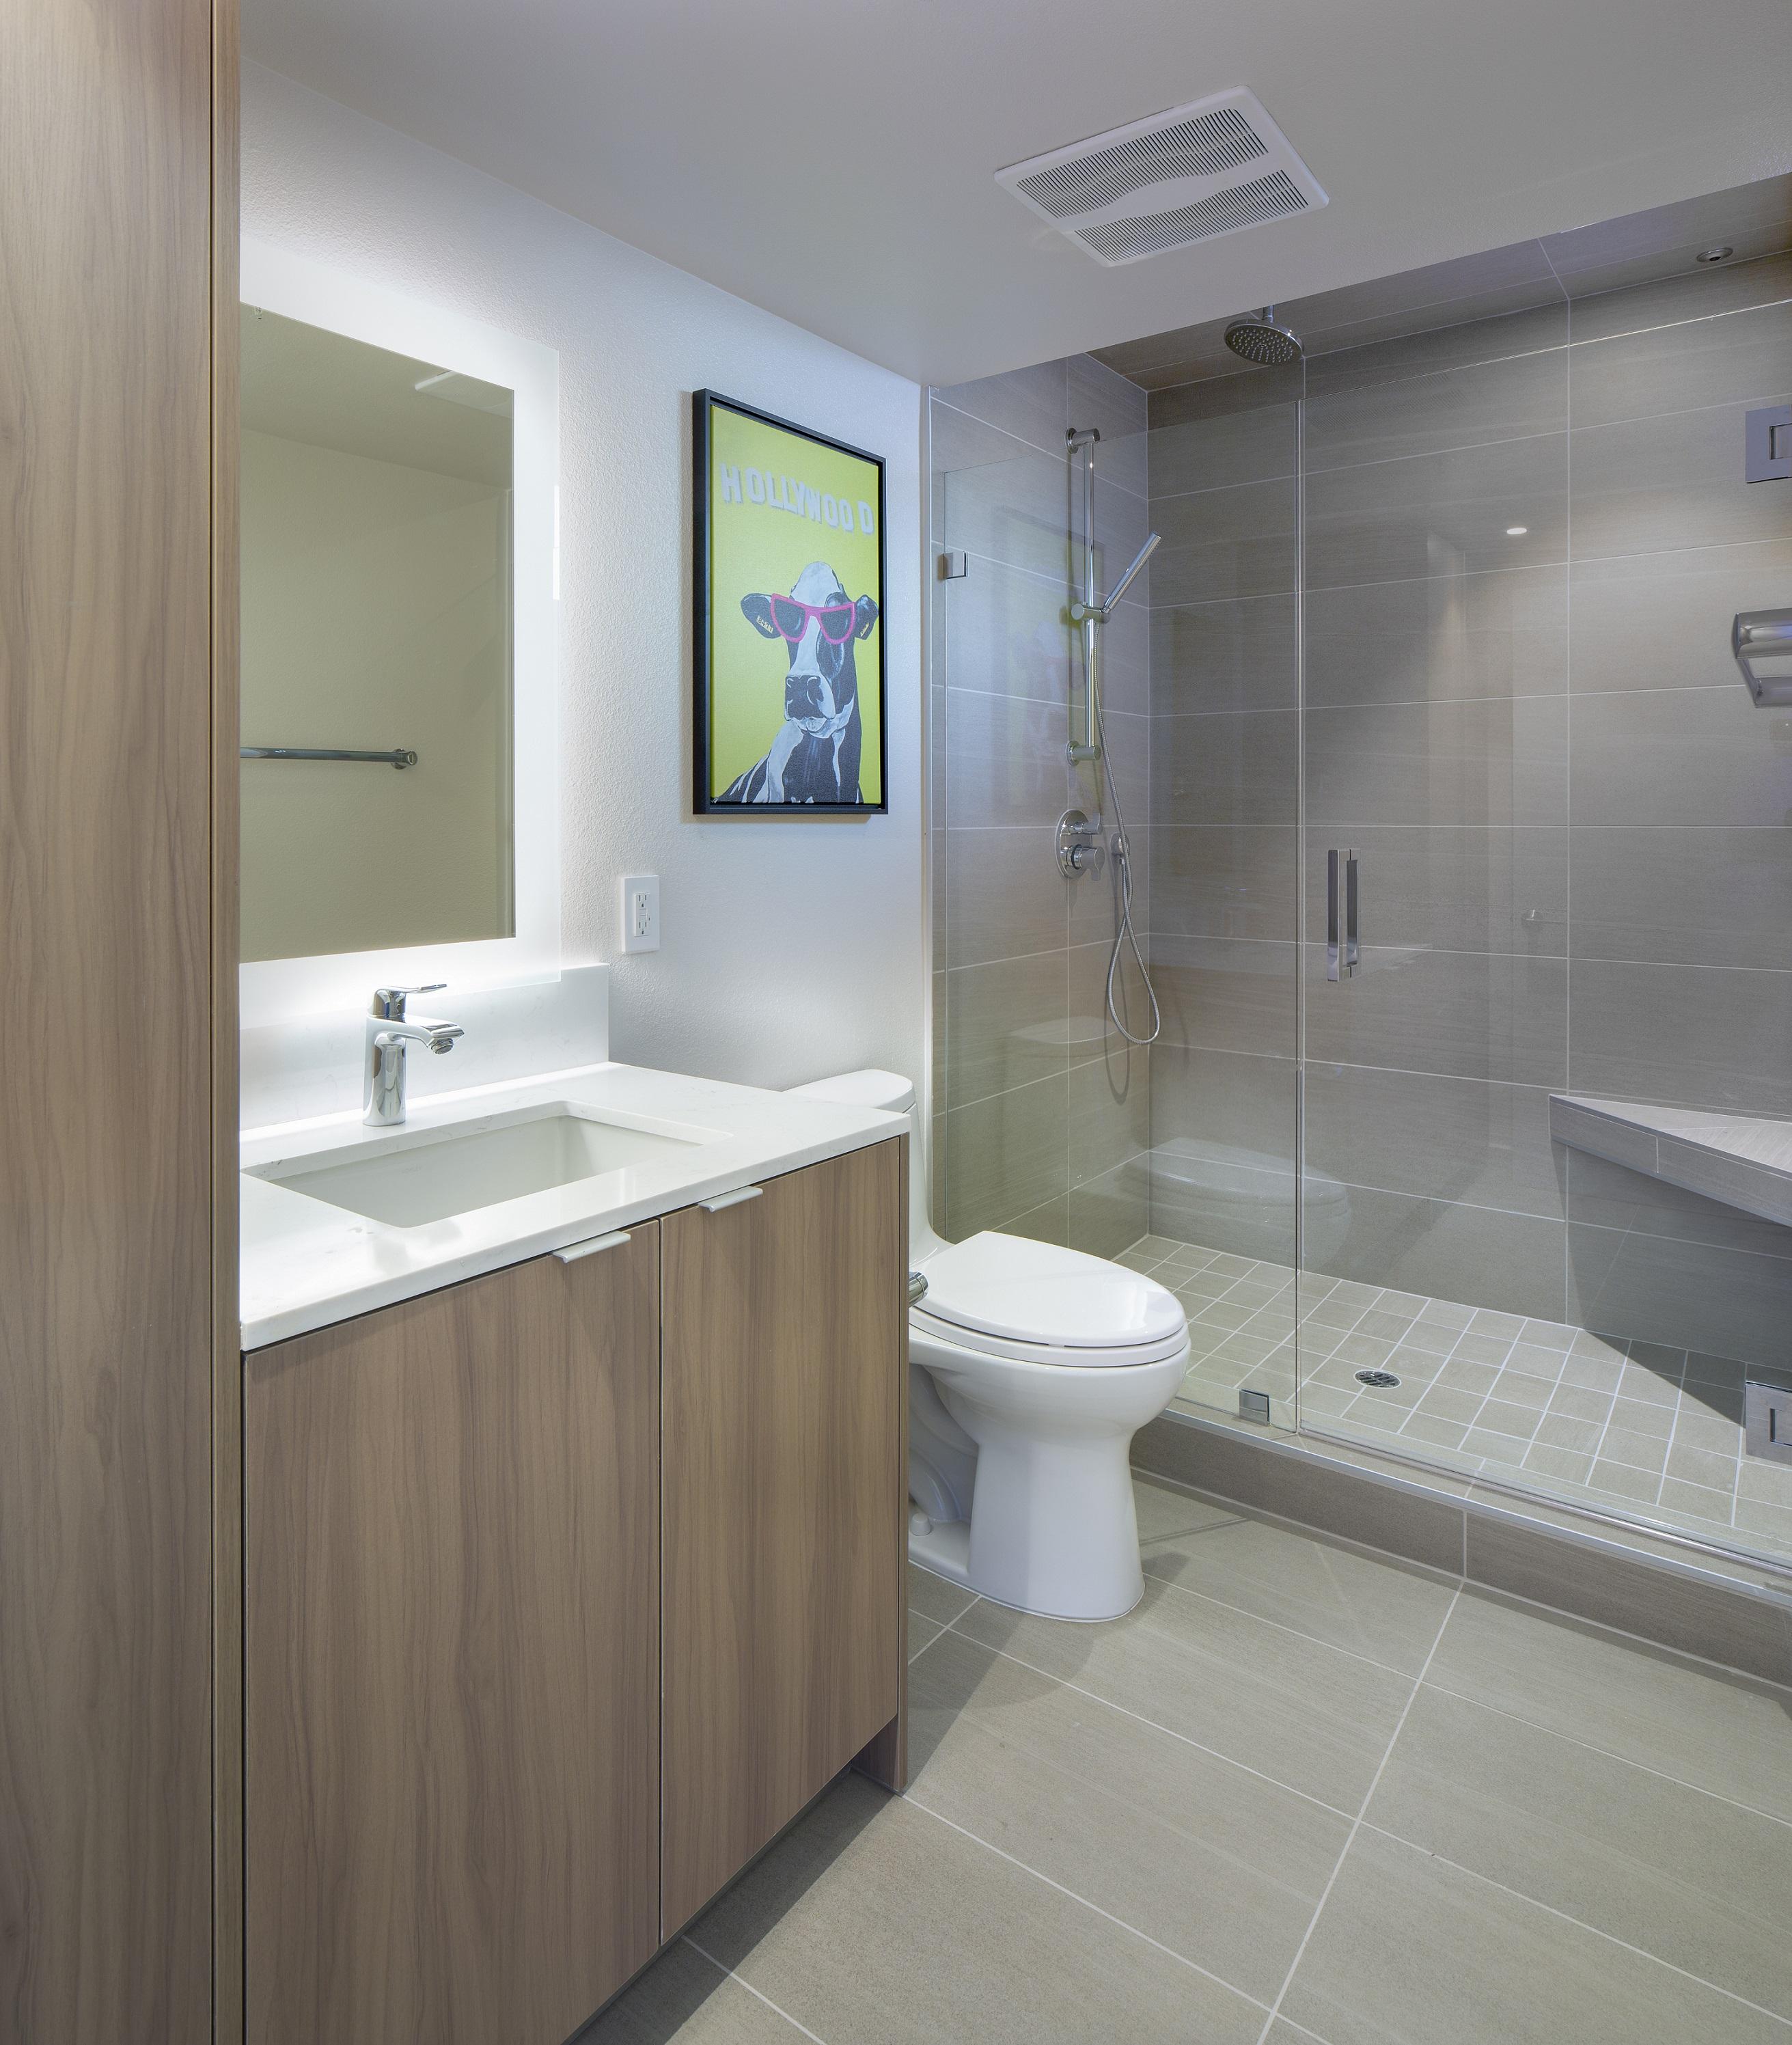 Mysuite At Acacia Furnished Suites, Lofts & Apartments Los